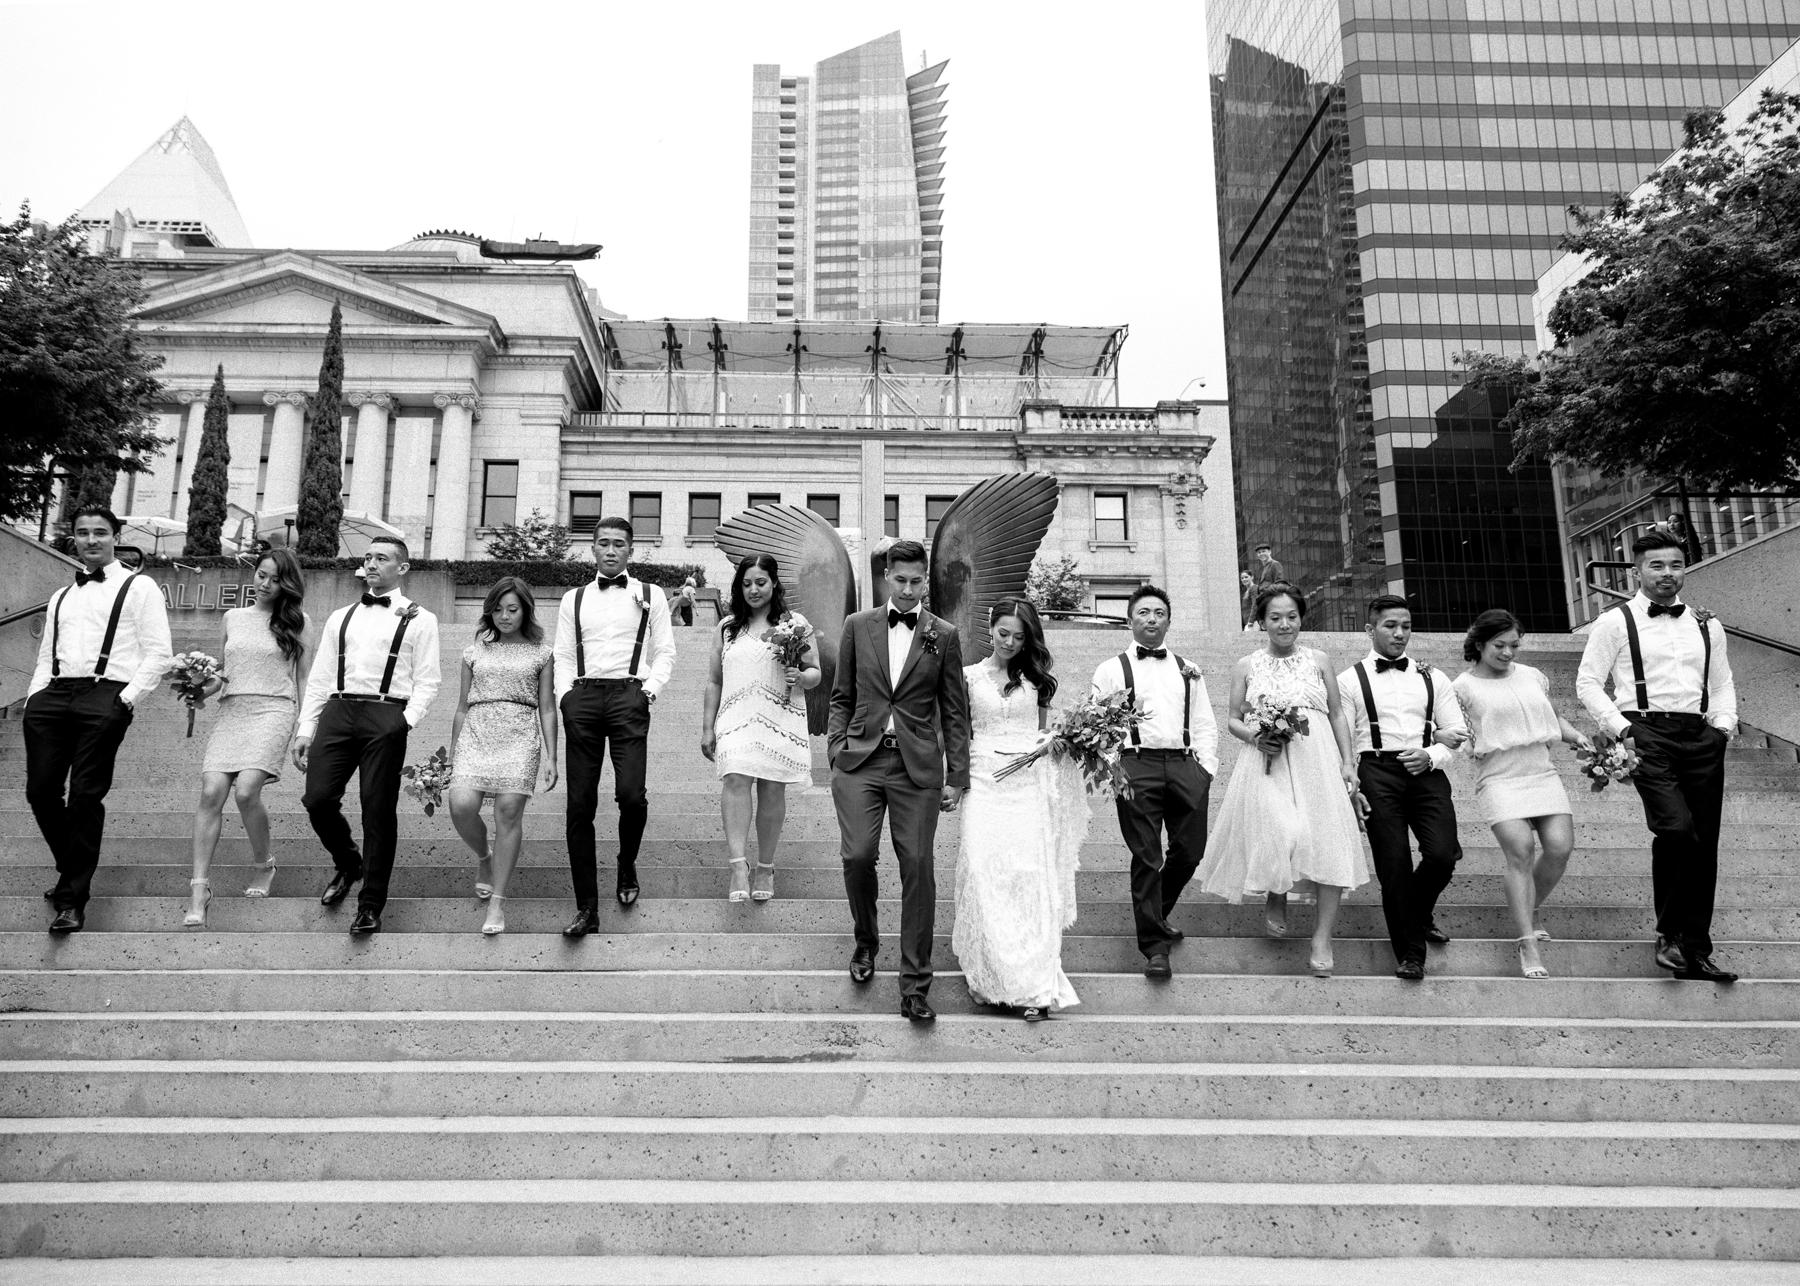 kaoverii_silva_photographer_via-herafilms_kieu_kaz_wedding-18.jpg